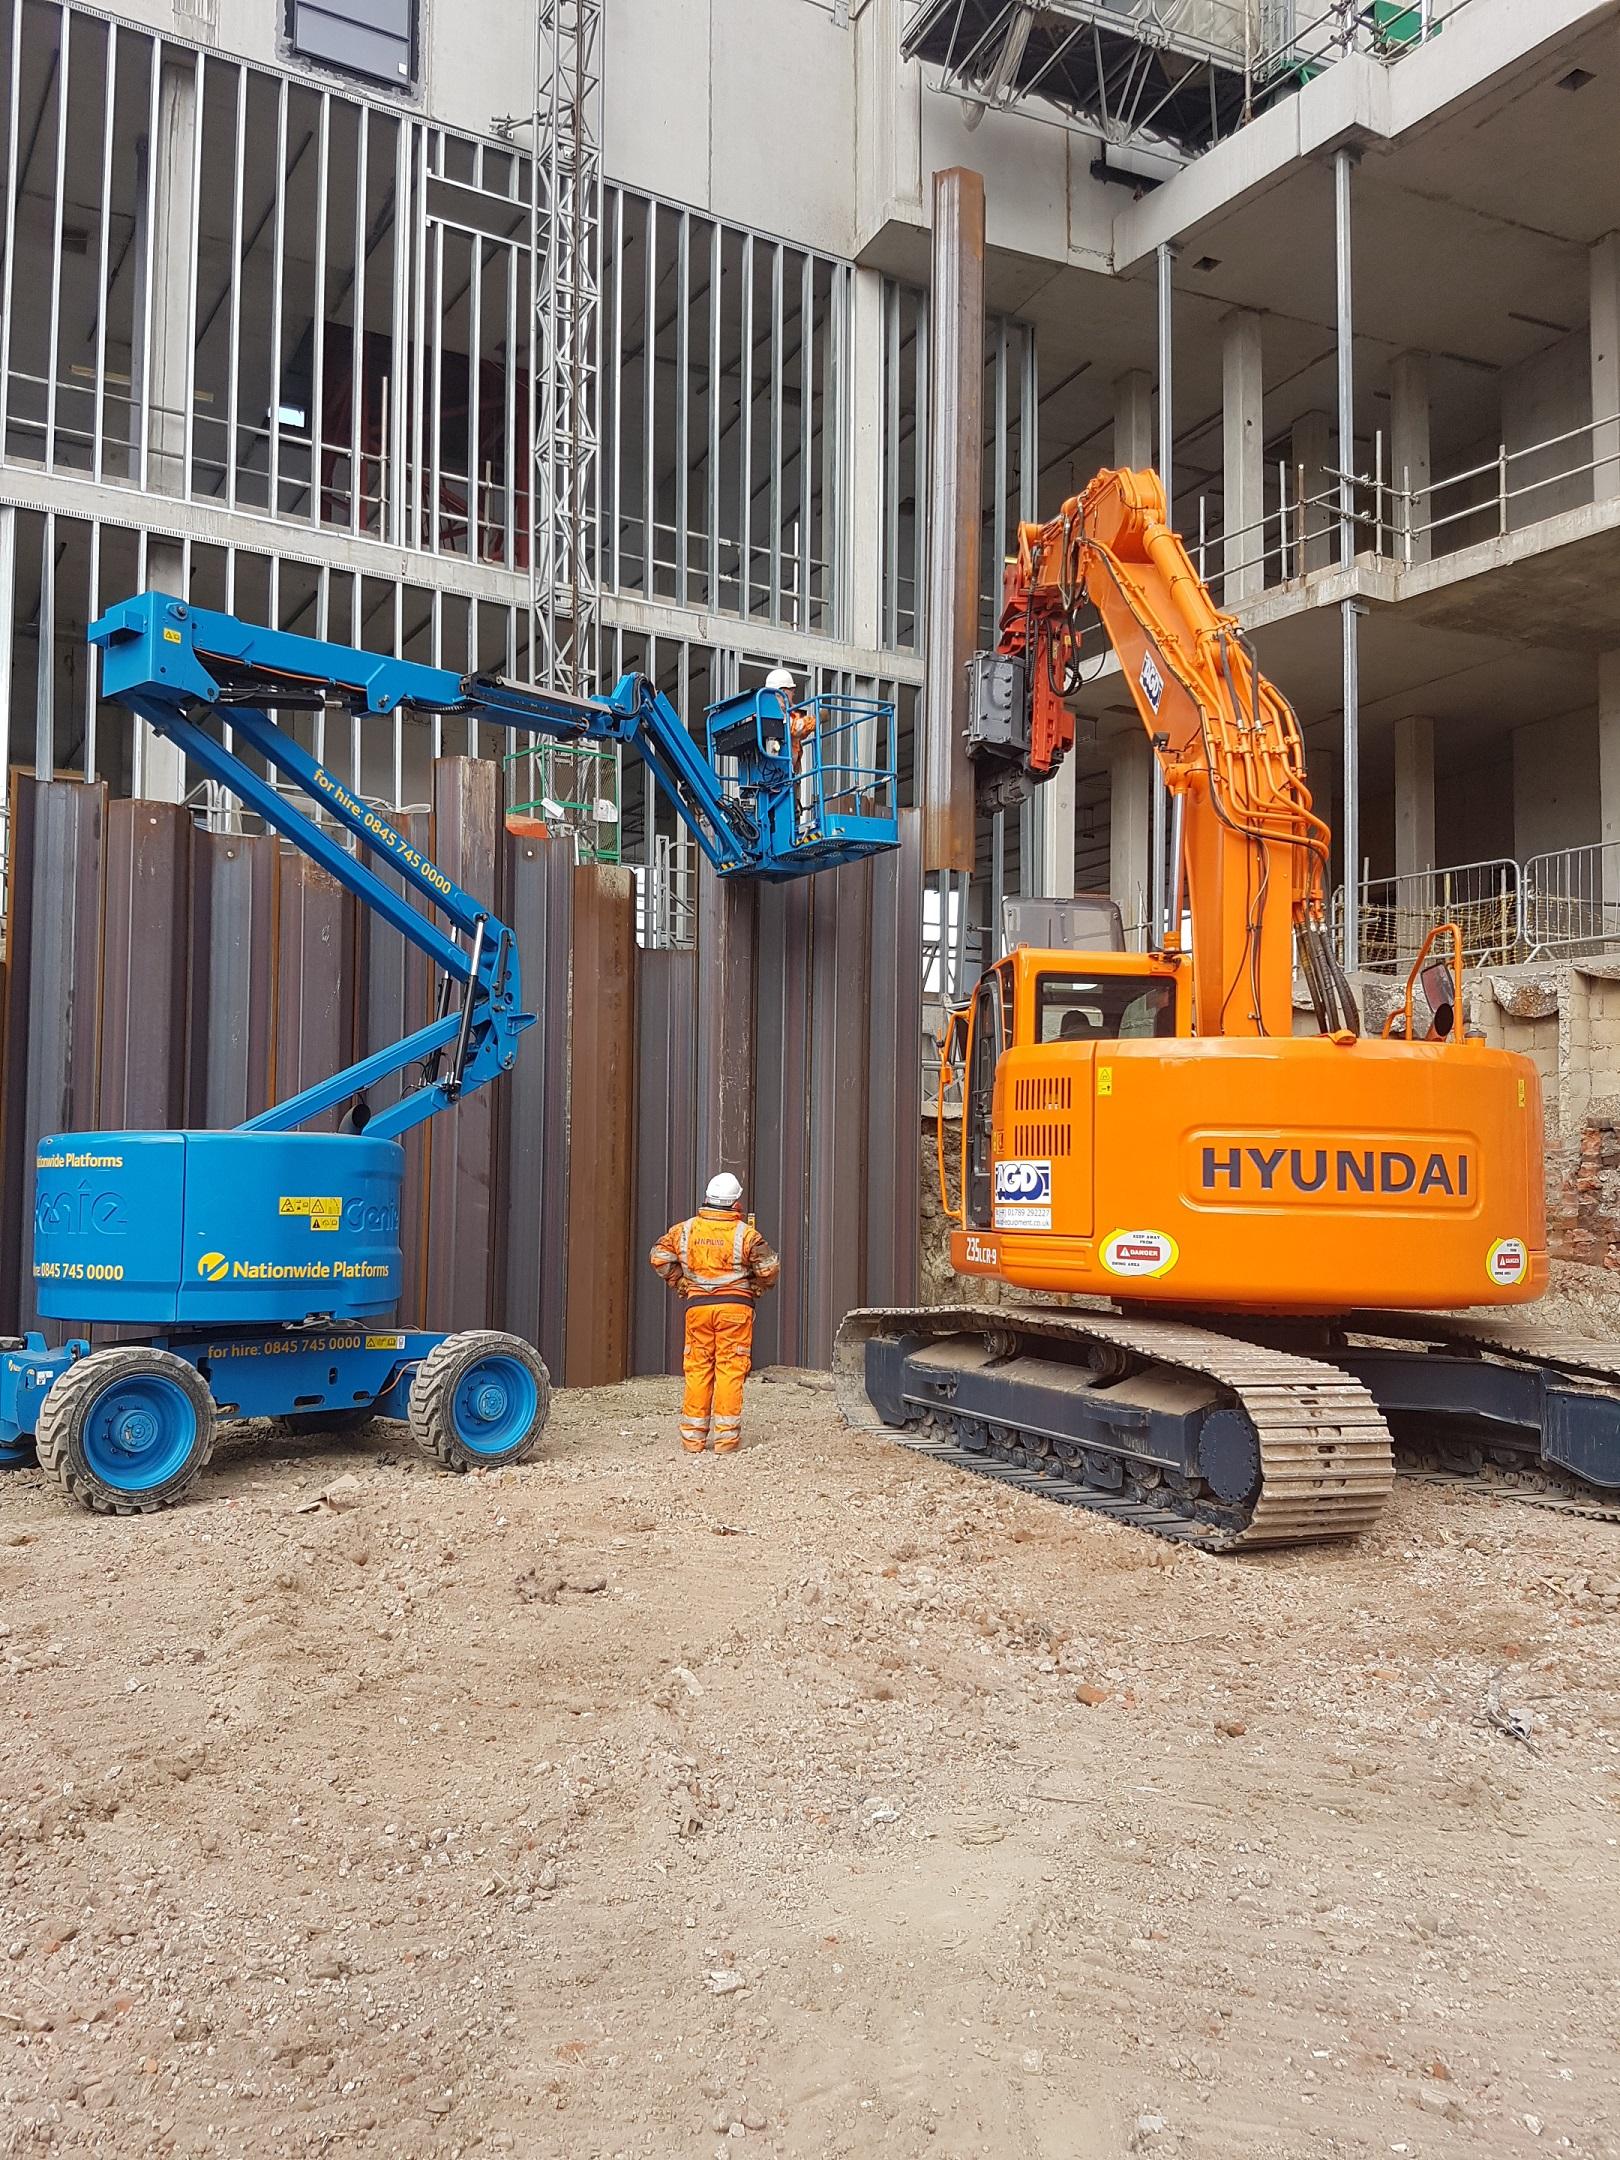 Pile driver hire, sheet piles, precast piles, tubular piles, railway piling, air hammers